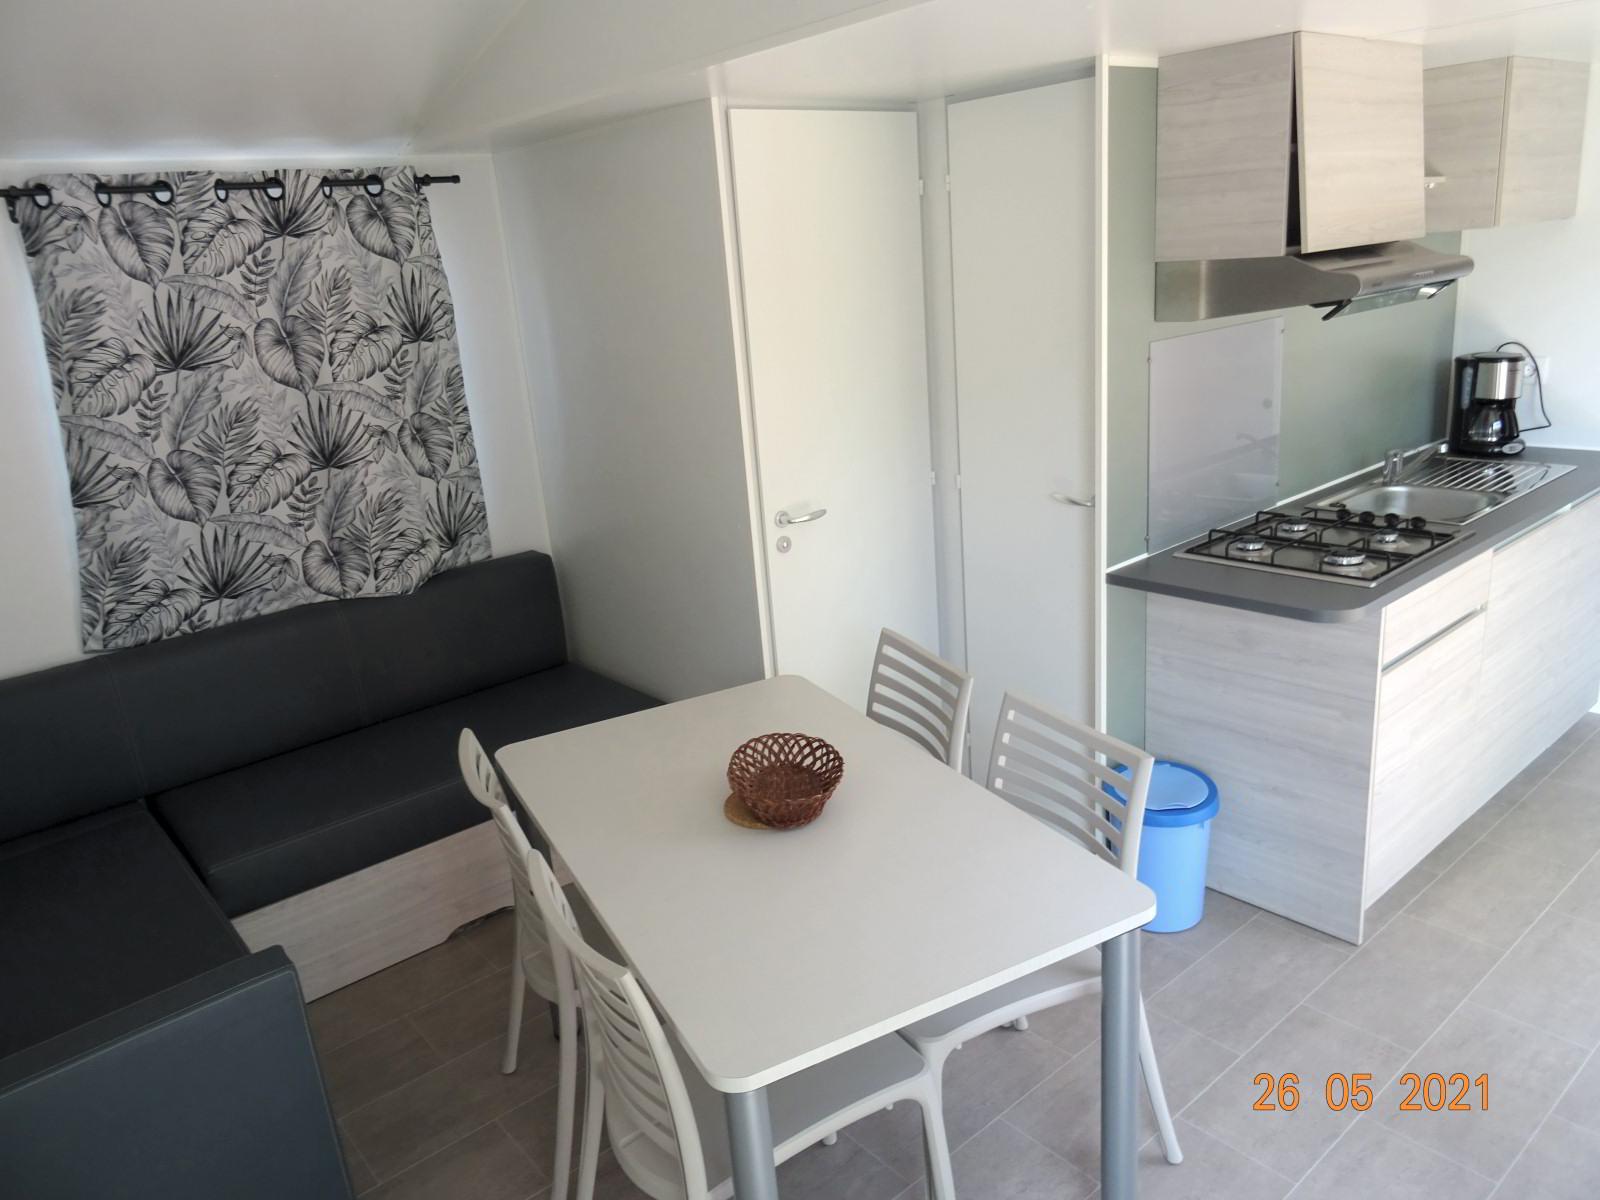 Woonkamer en keuken, nieuwe stacaravan met 2 slaapkamers